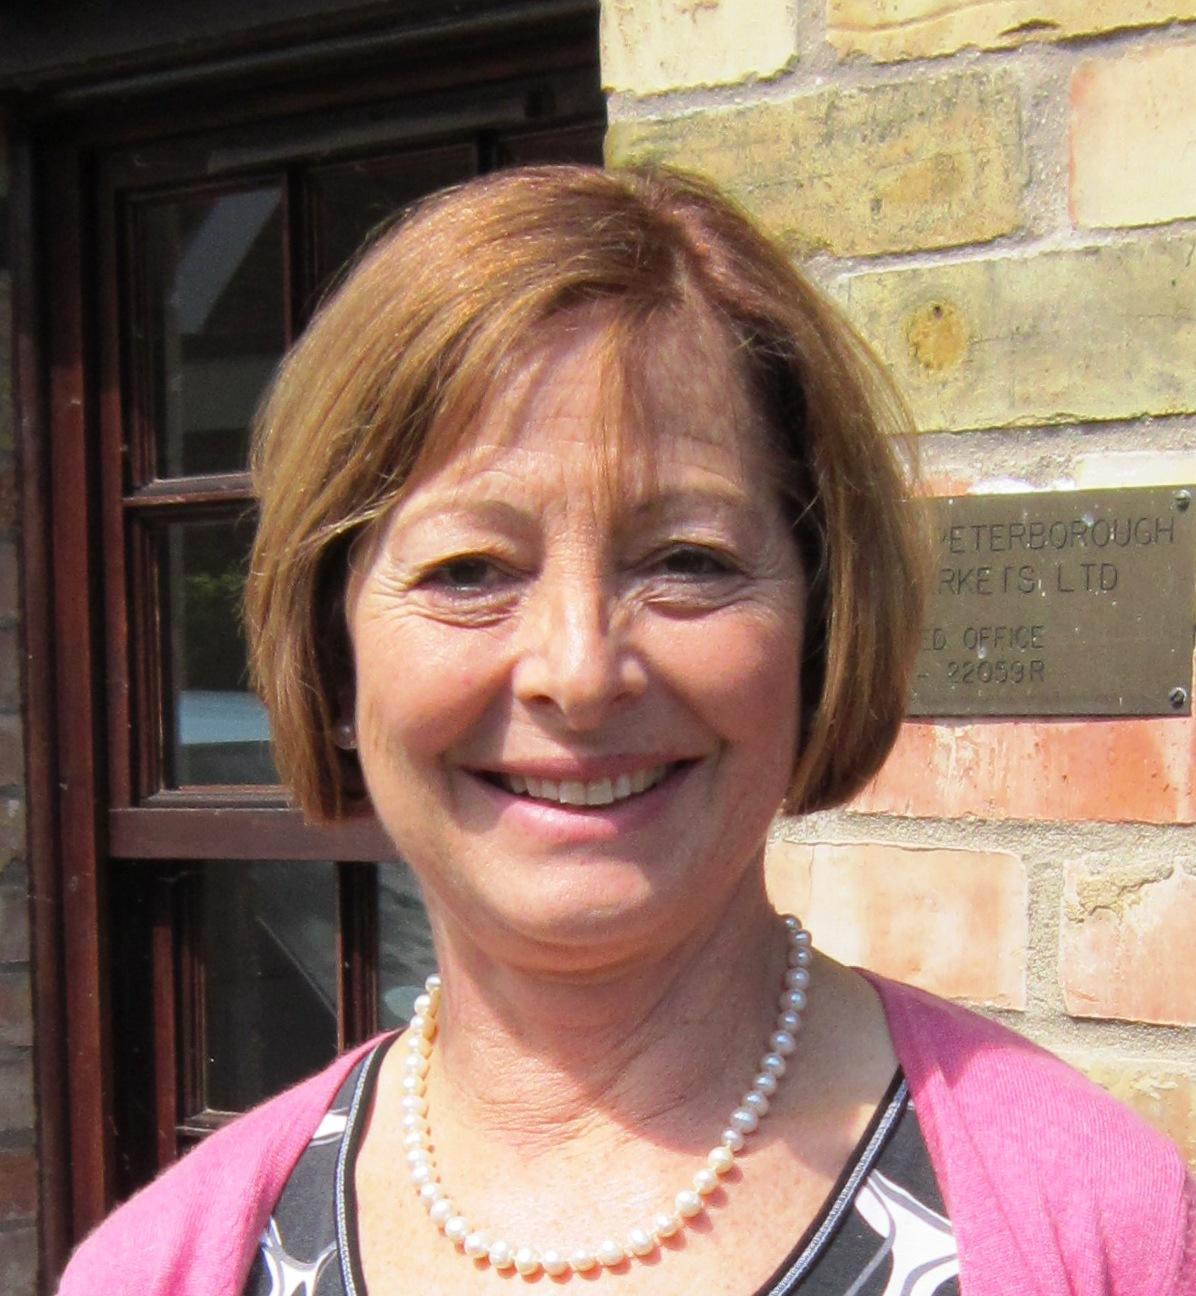 Karen Prestage, new vice Chairman